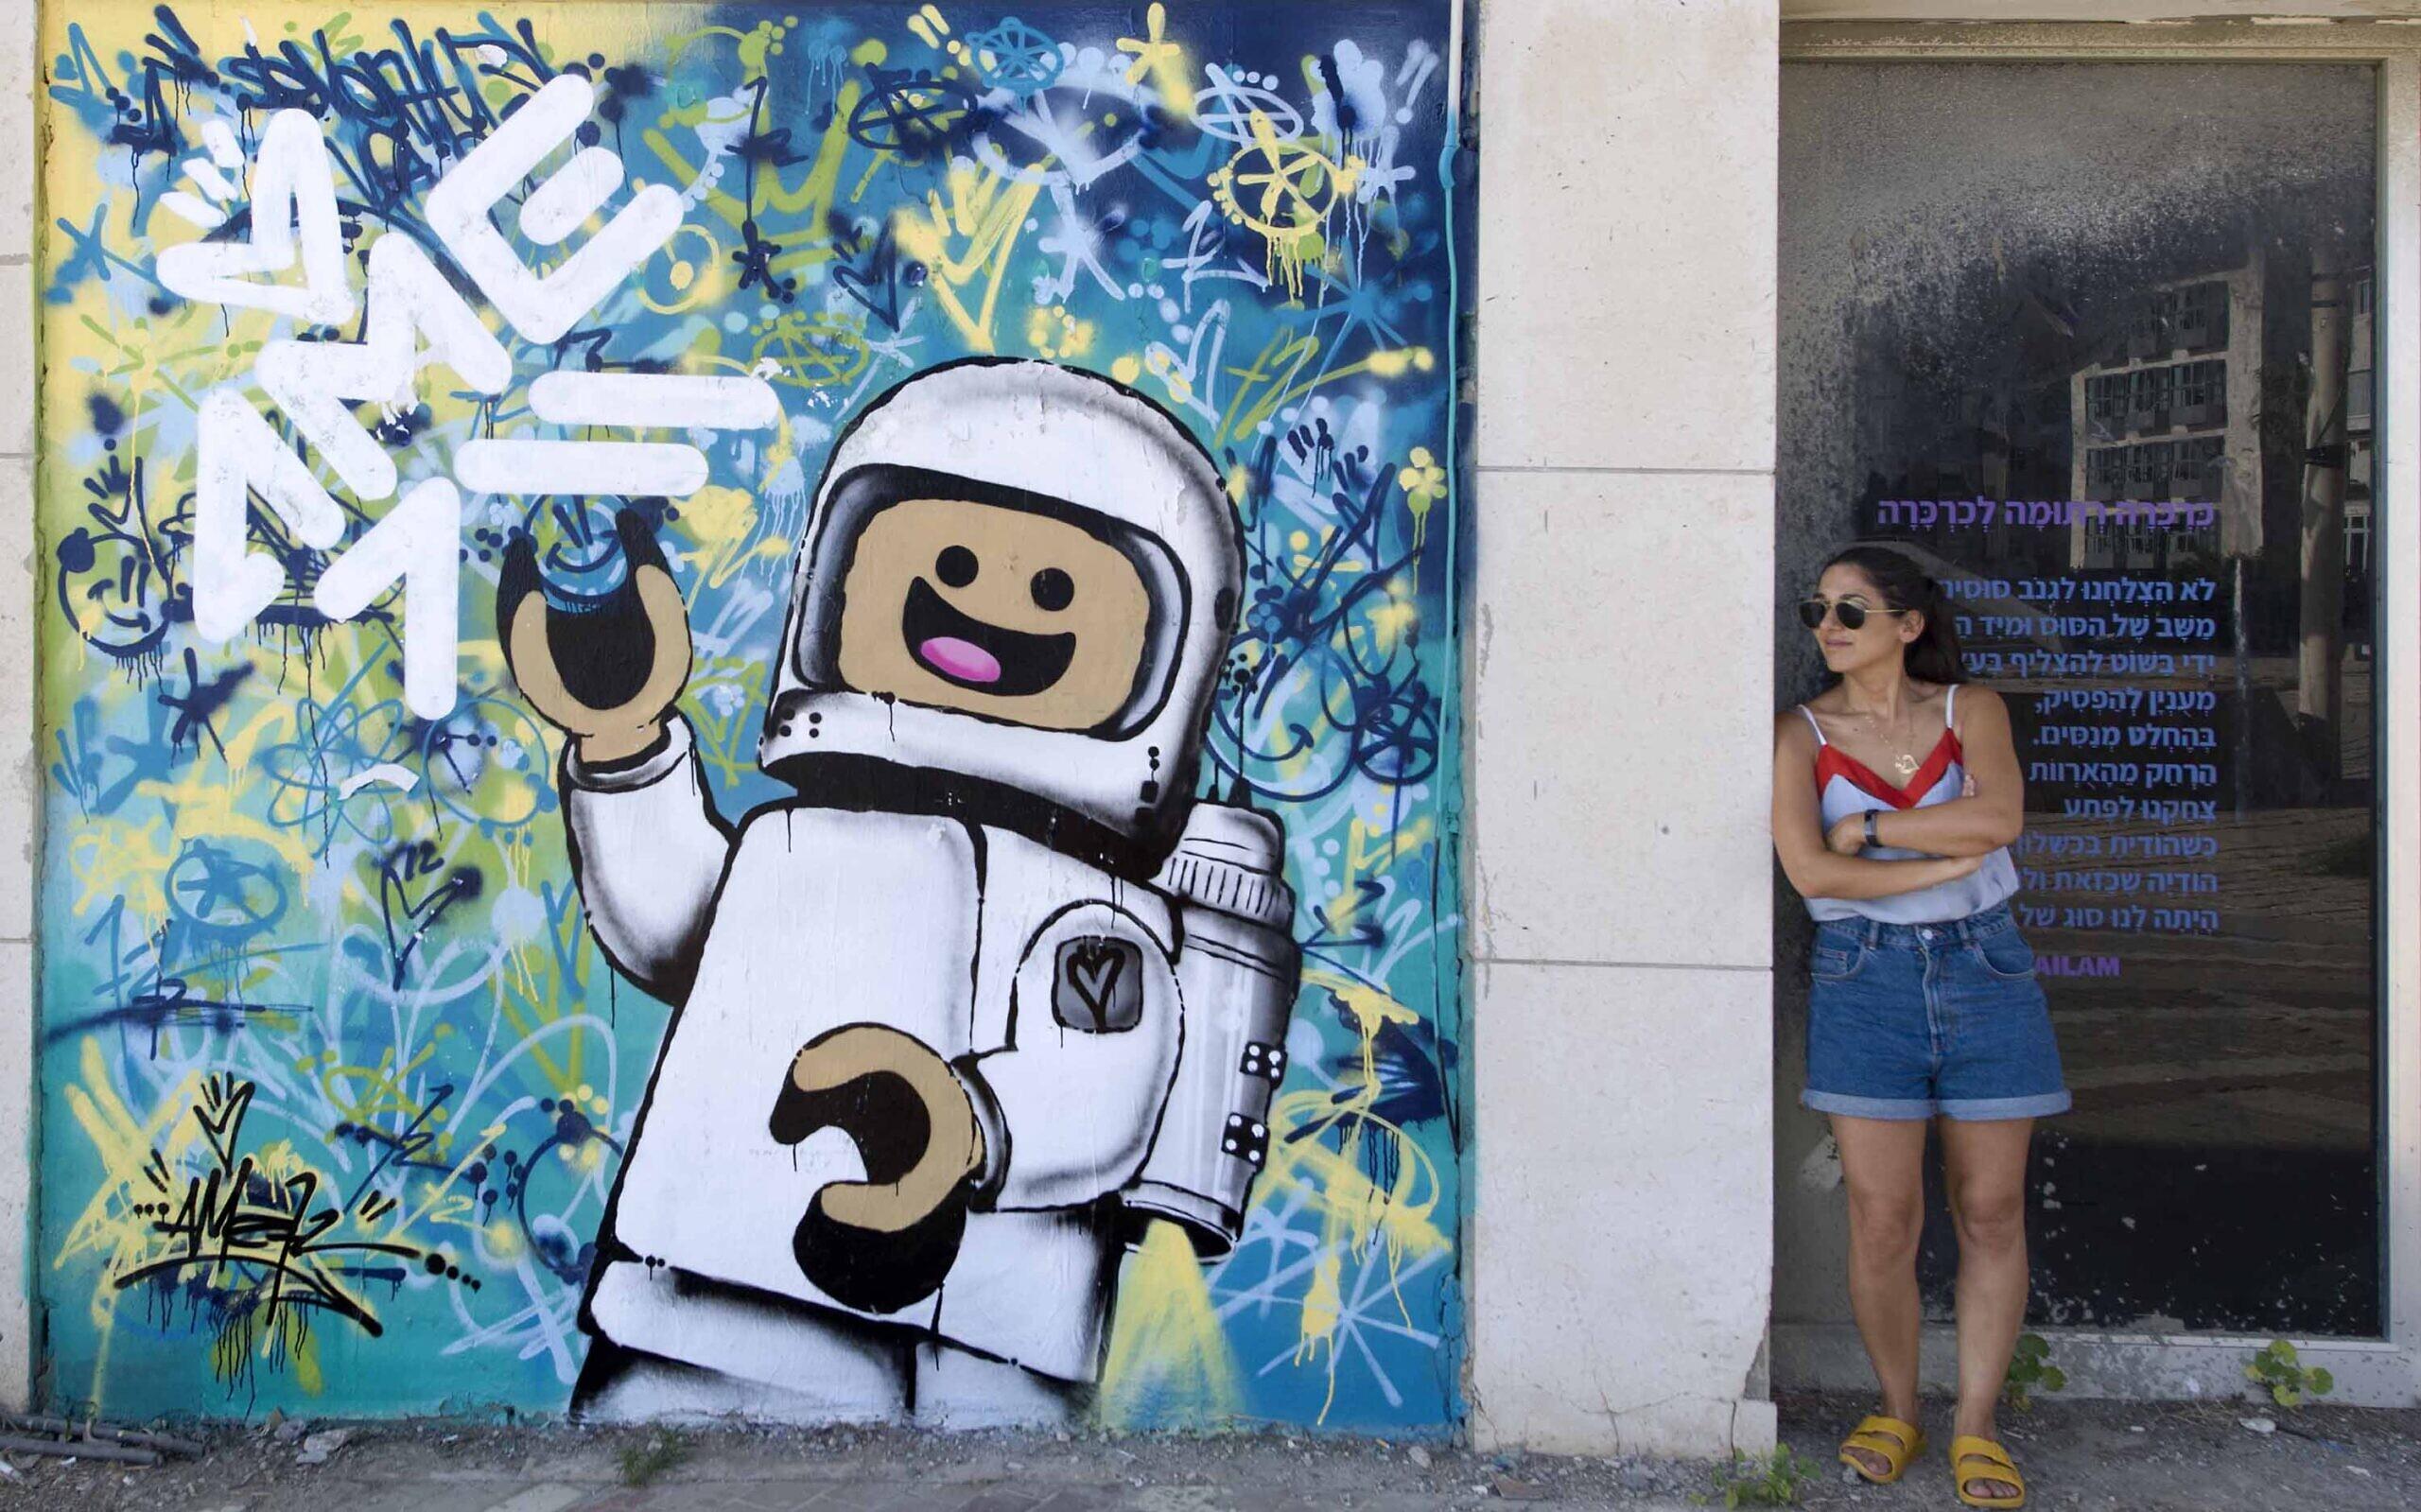 Street art in Tel Aviv by Ame 72. (Lord K2)